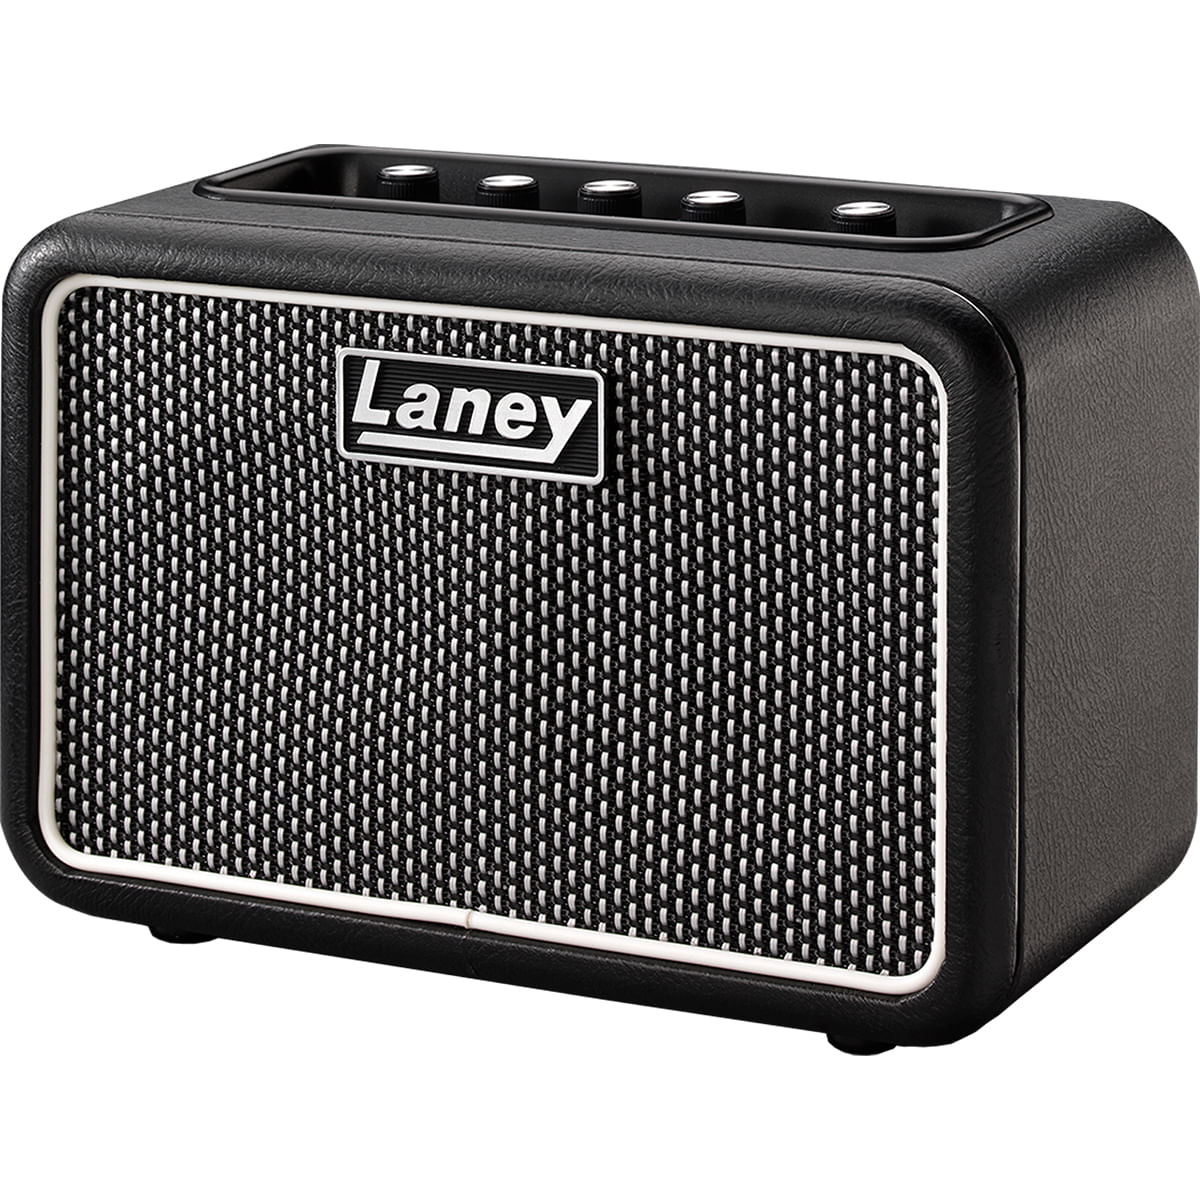 amplificador-de-guitarra-com-bluetooth-mini-stb-superg-laney-4